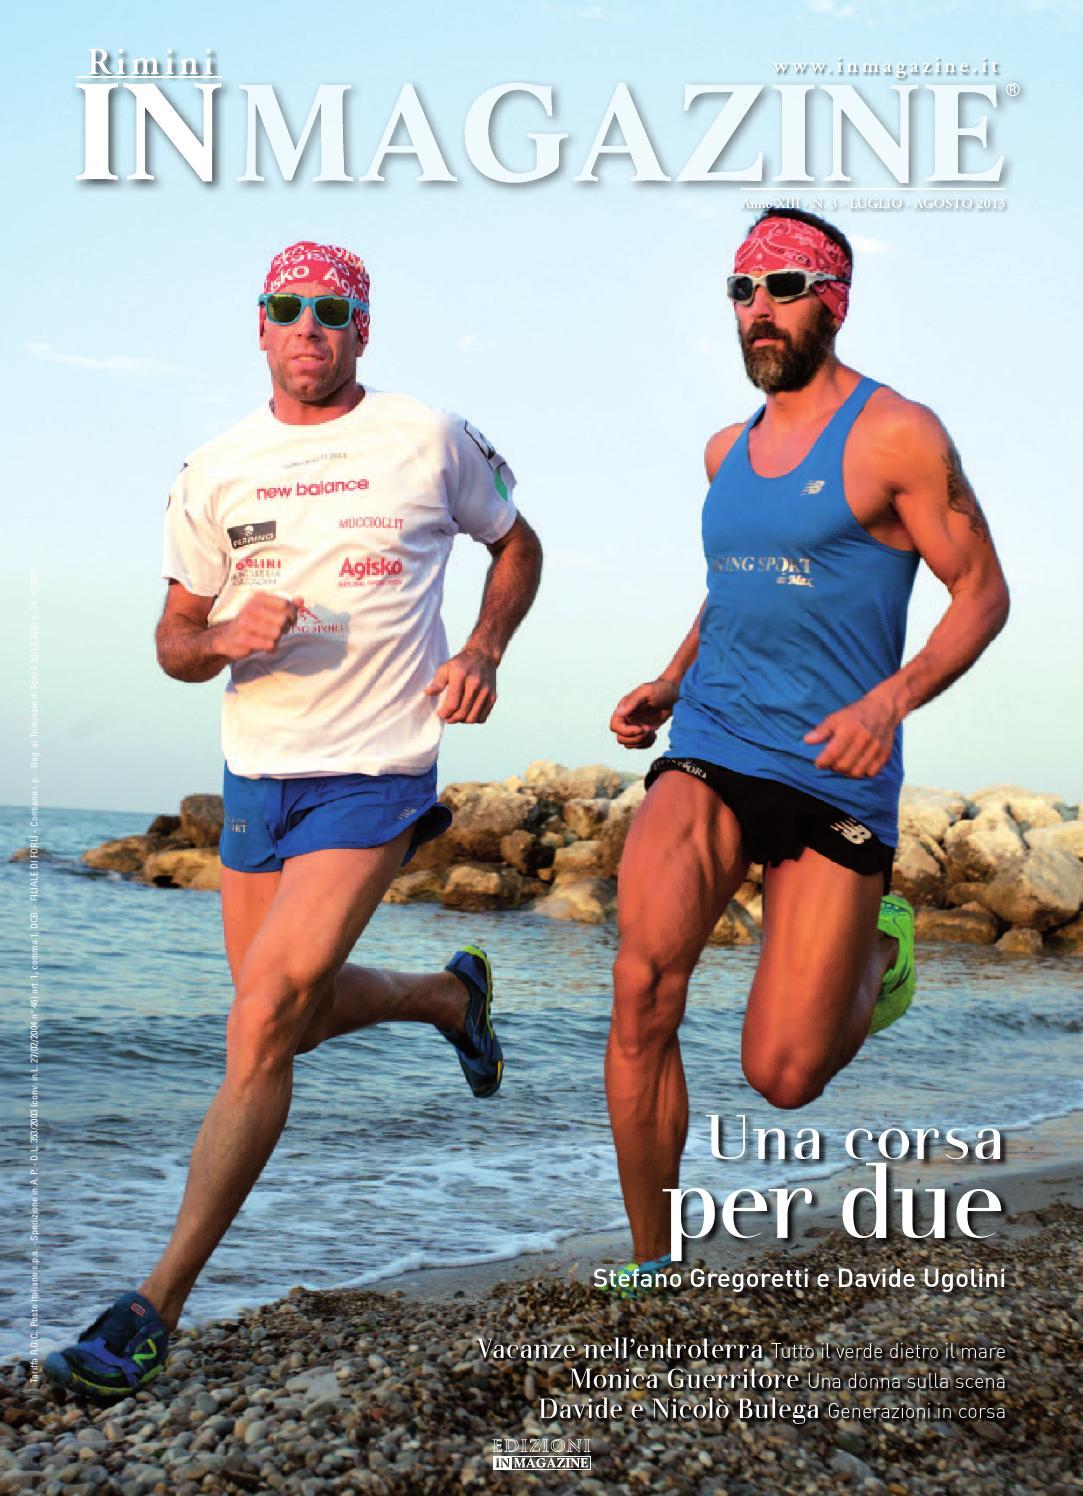 In Magazine Rimini 032013 By Edizioni Srl Issuu